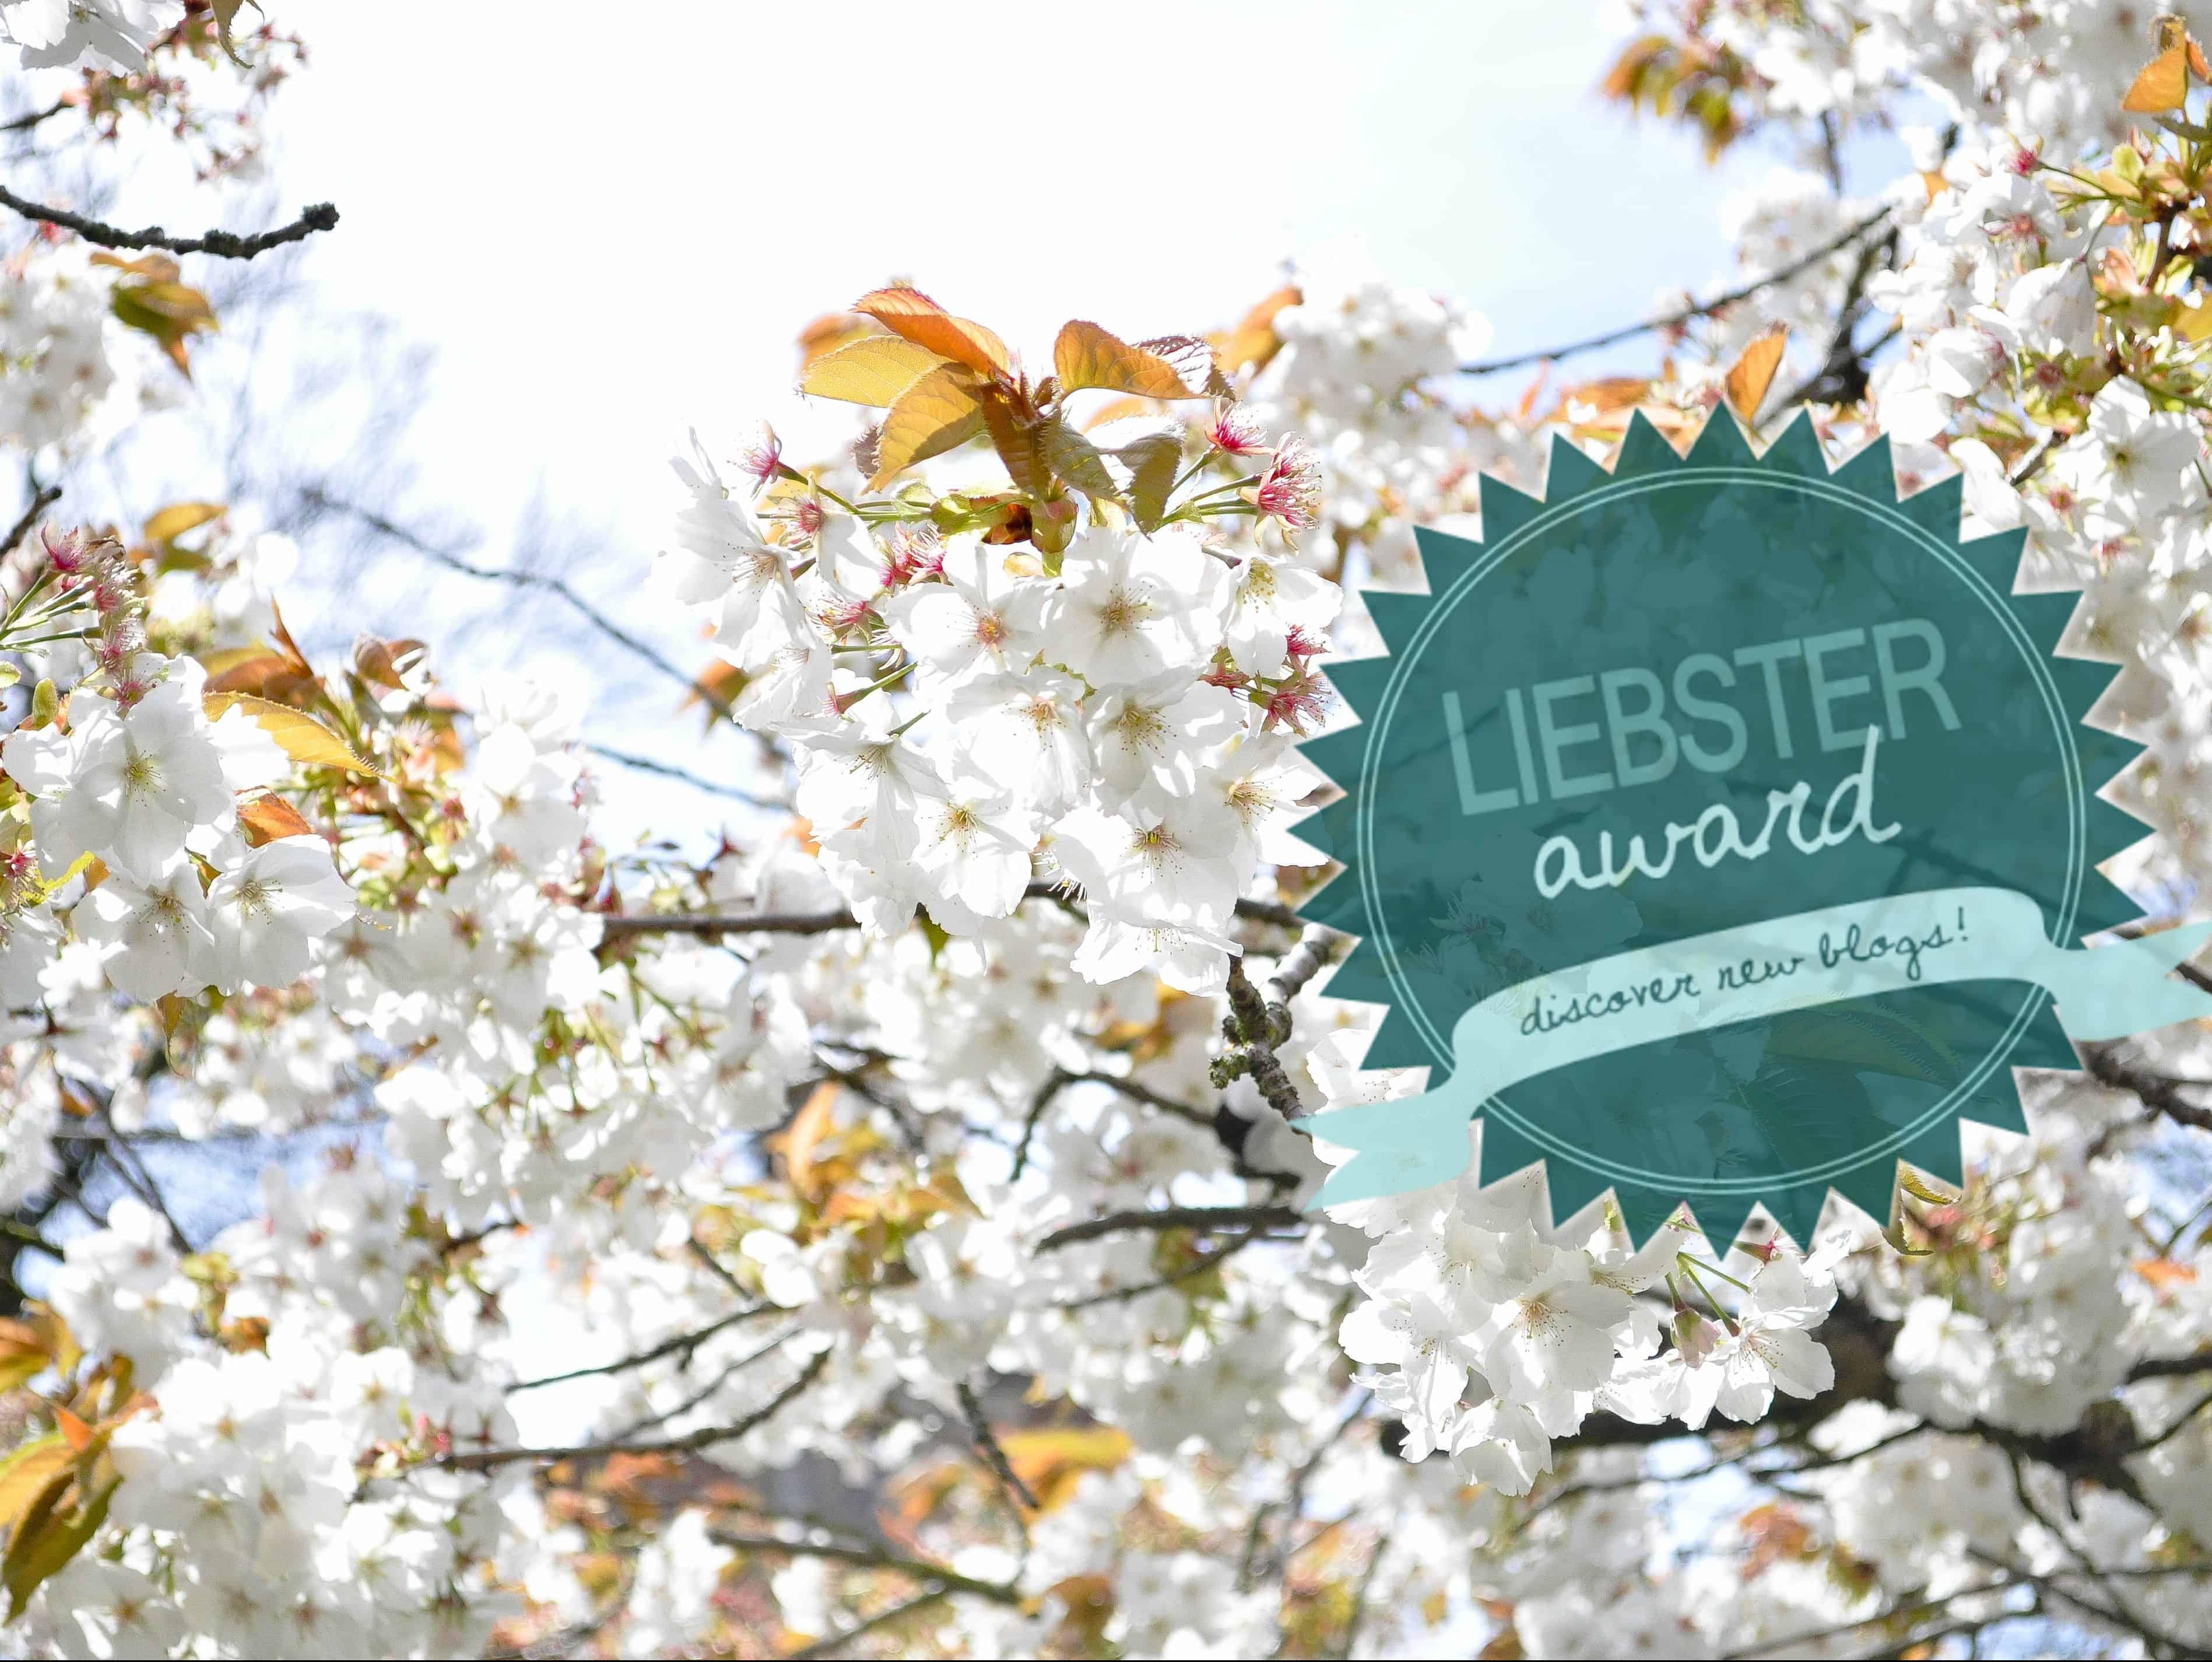 We've been nominated for a Liebster Award!